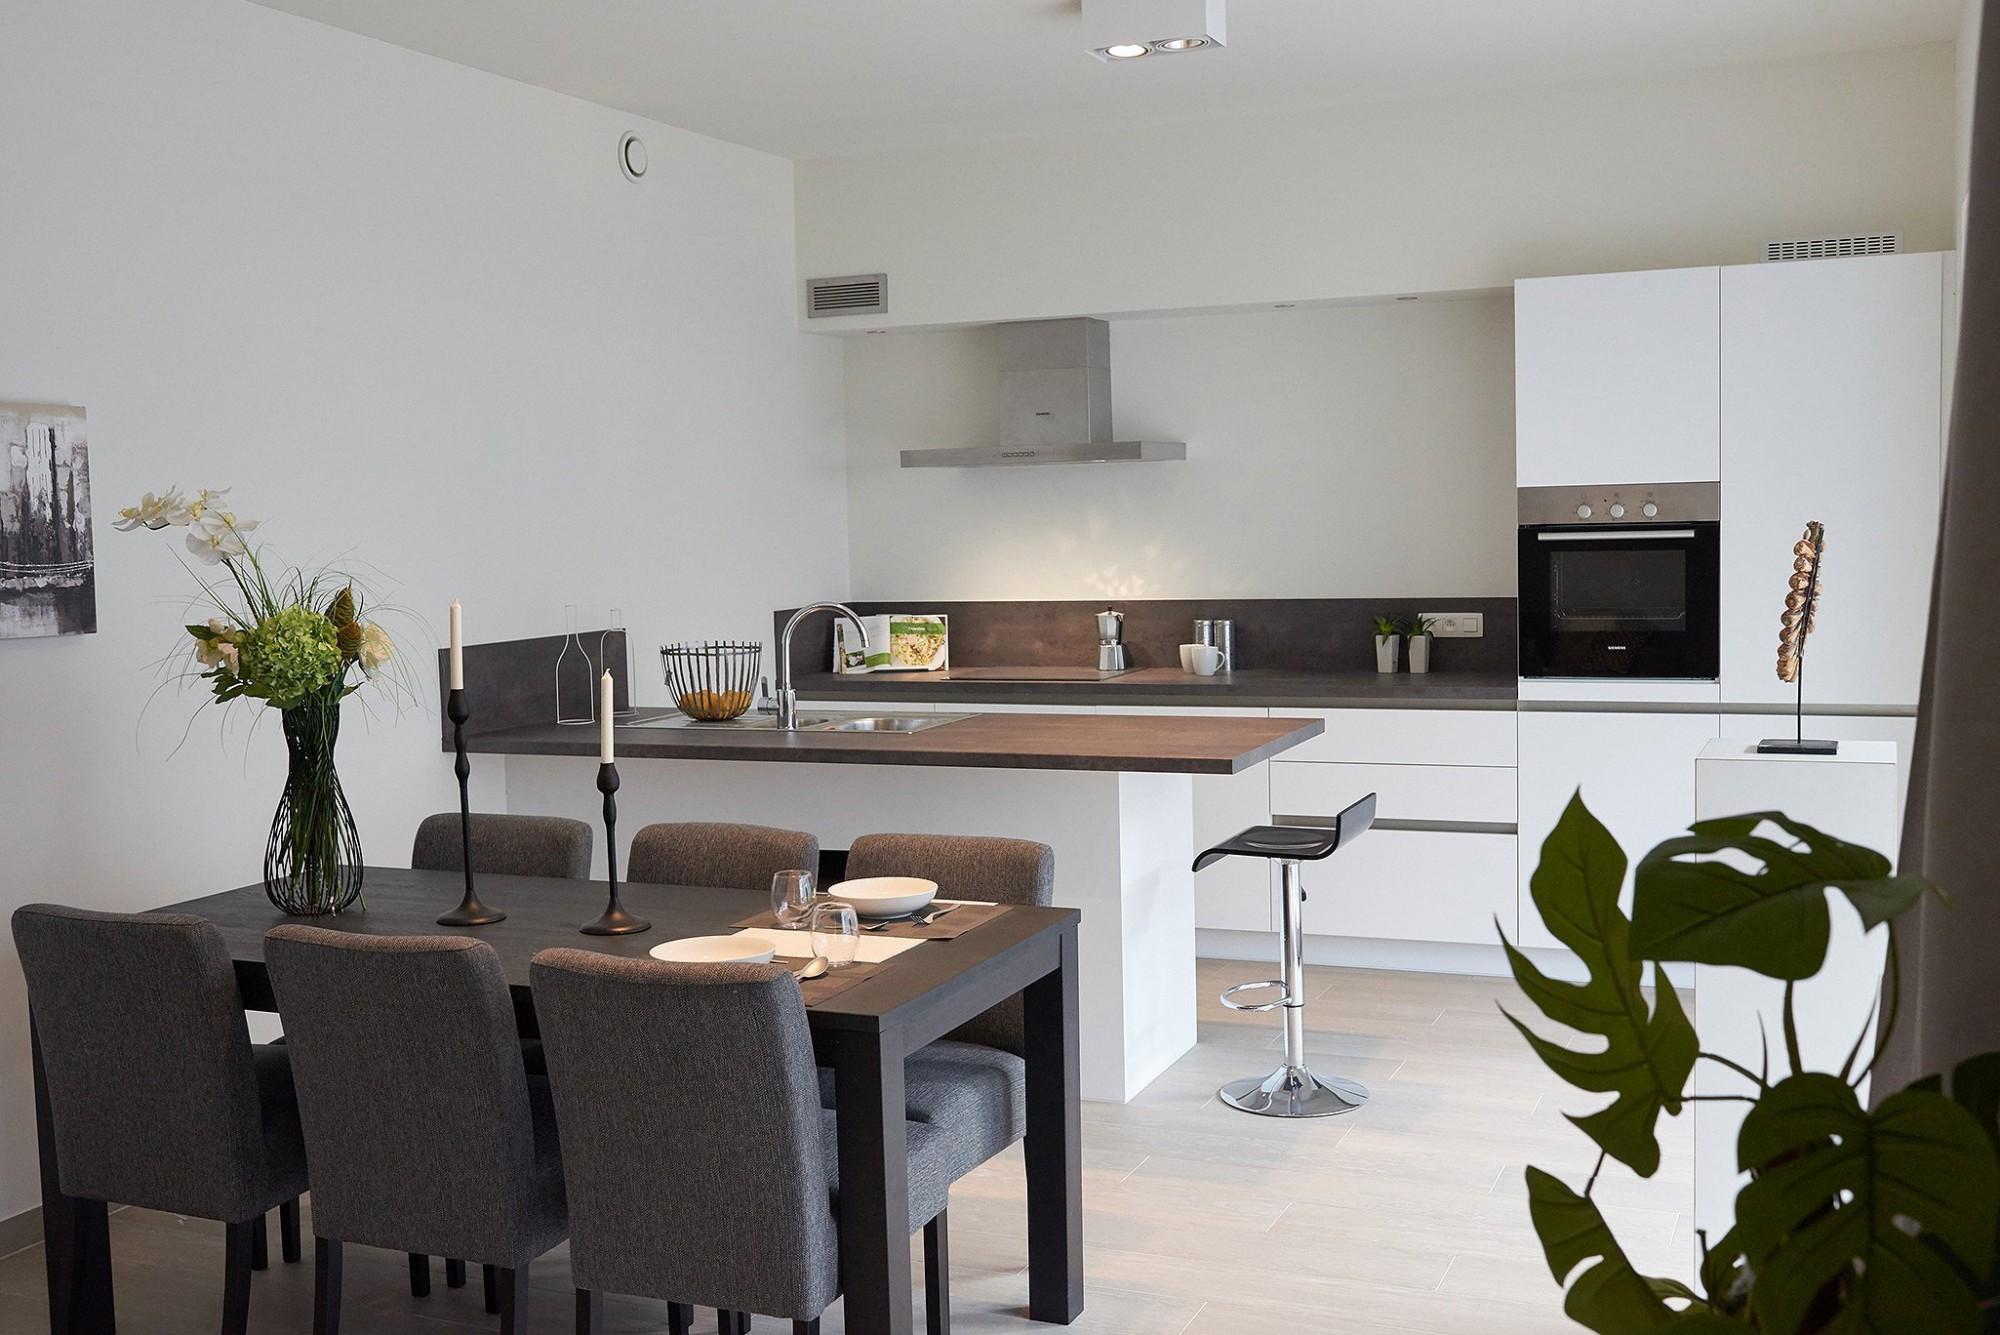 Fotografie van keukens en badkamers interieurfotografie meubels